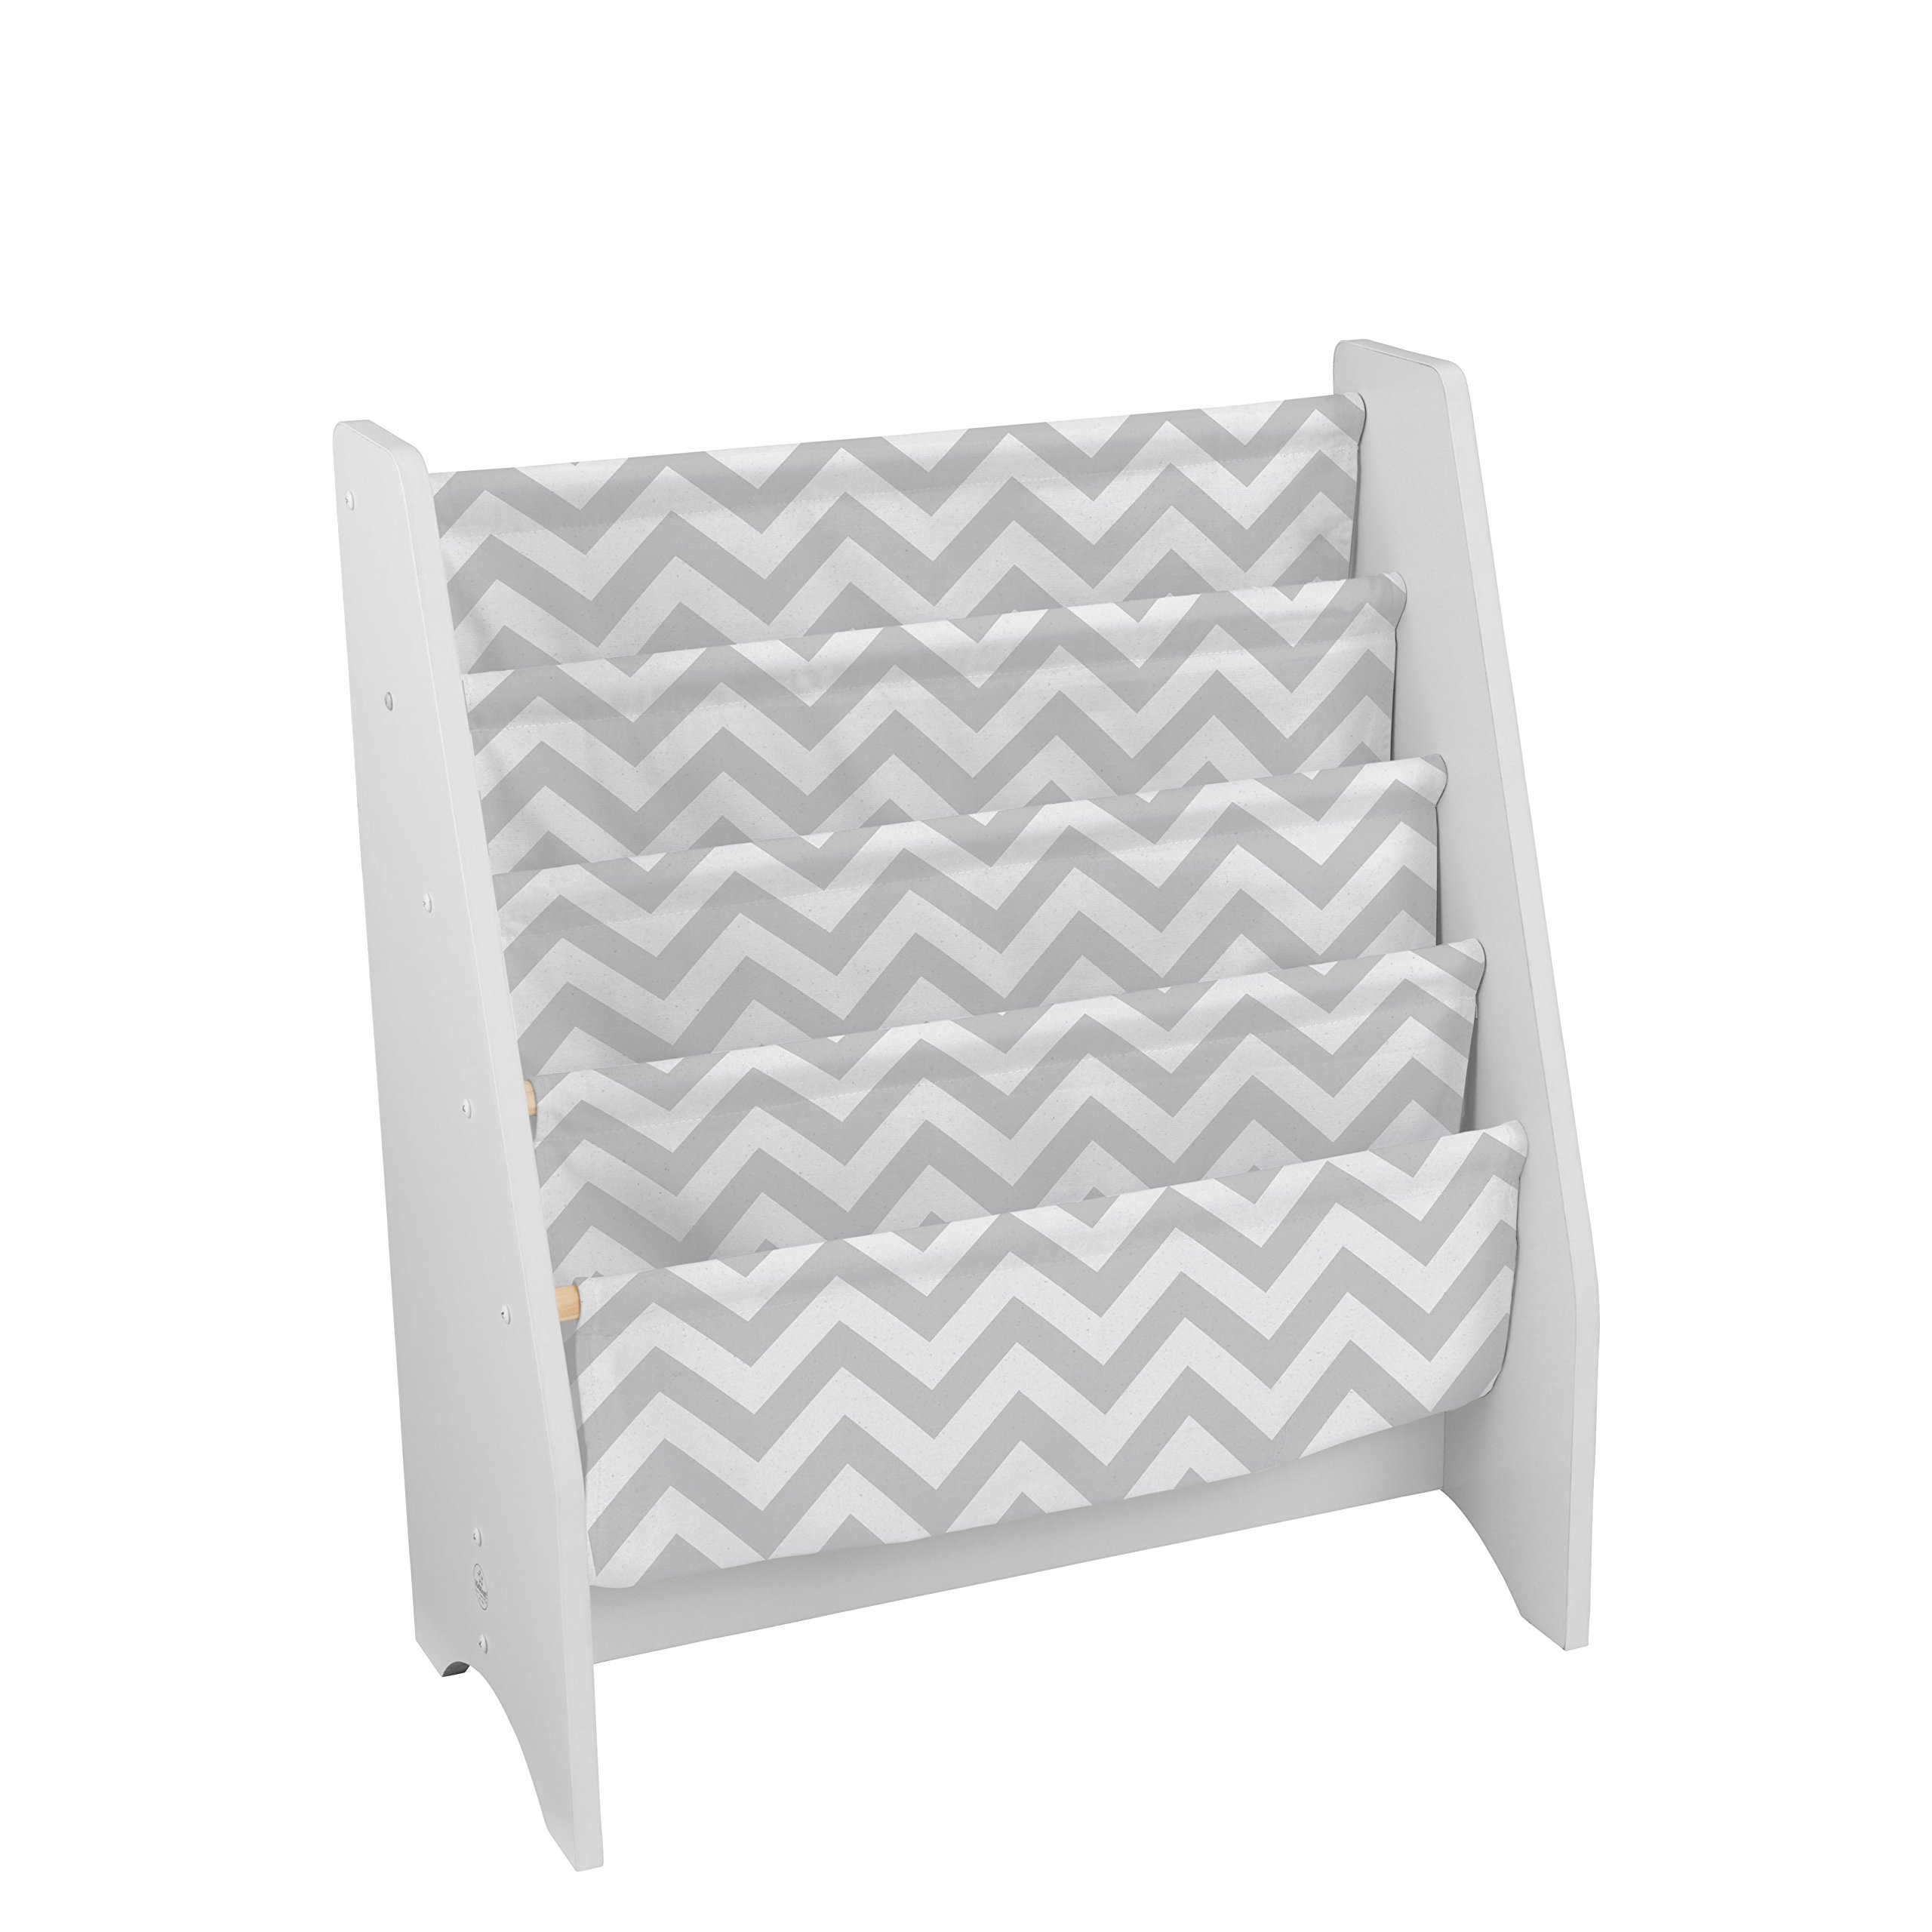 KidKraft Wooden Sling Bookcase - Gray & White- Sturdy Canvas Fabric, Chevron Pattern, Kids Bookshelf, Young Reader Support by KidKraft